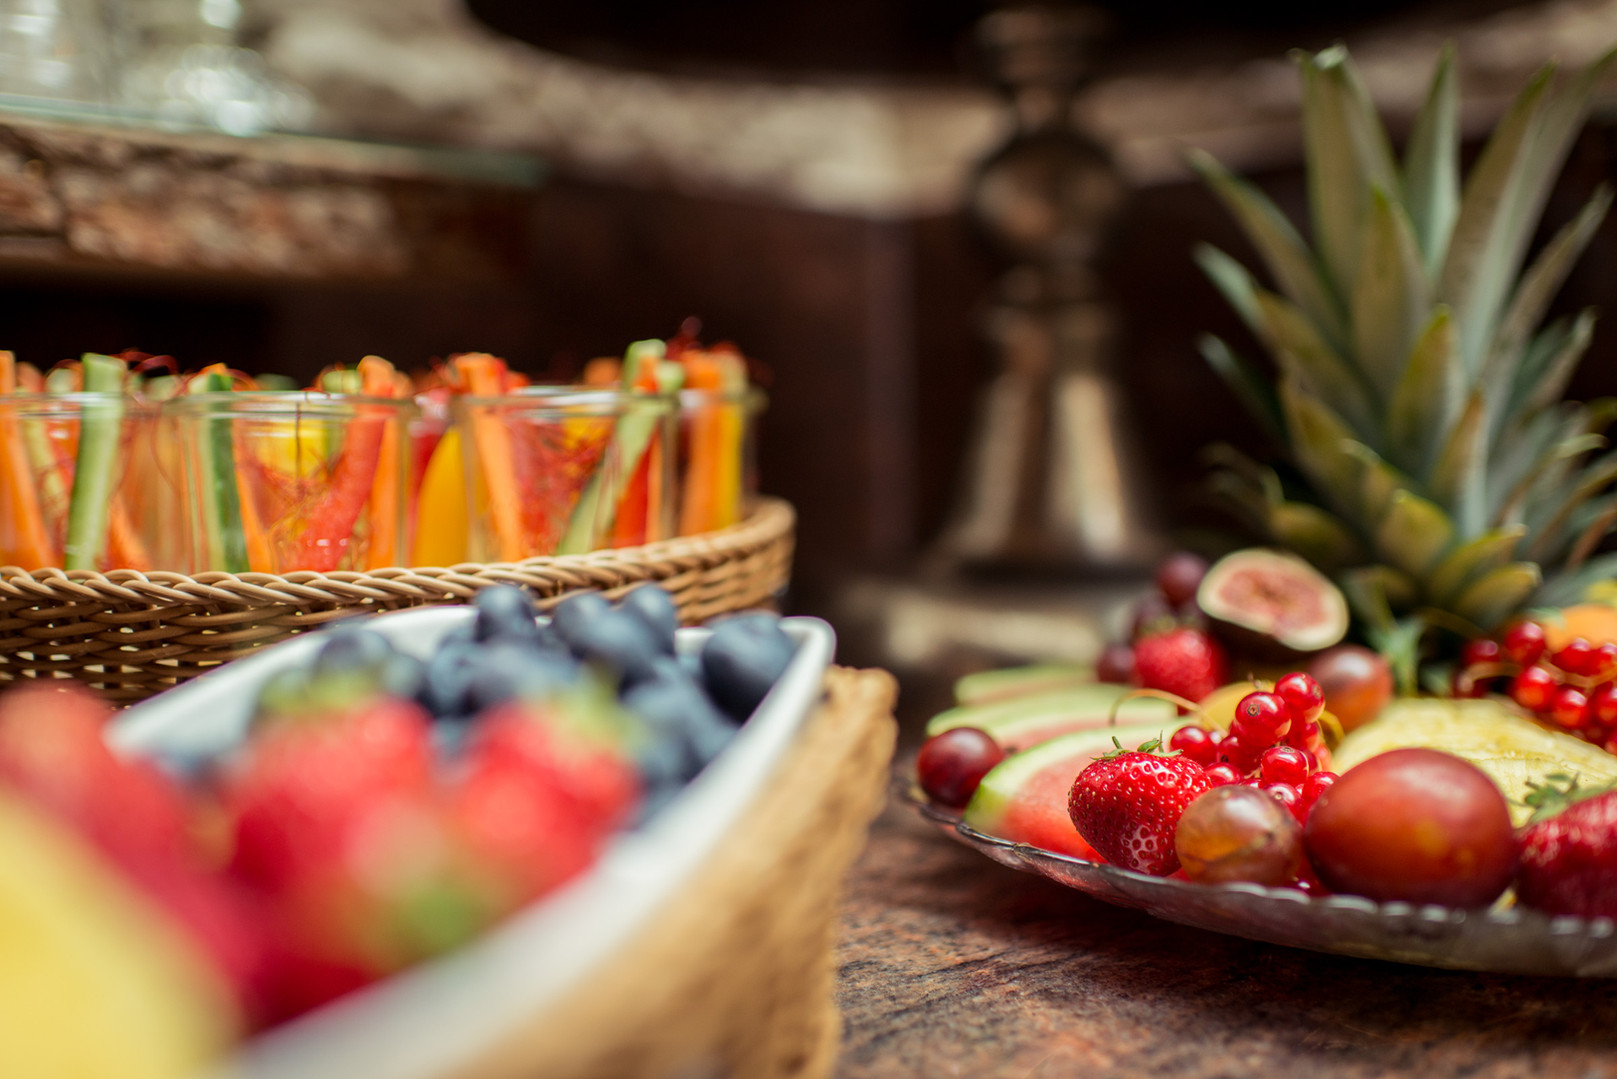 Obstplatte im Hotel Wegner - the culinary art hotel